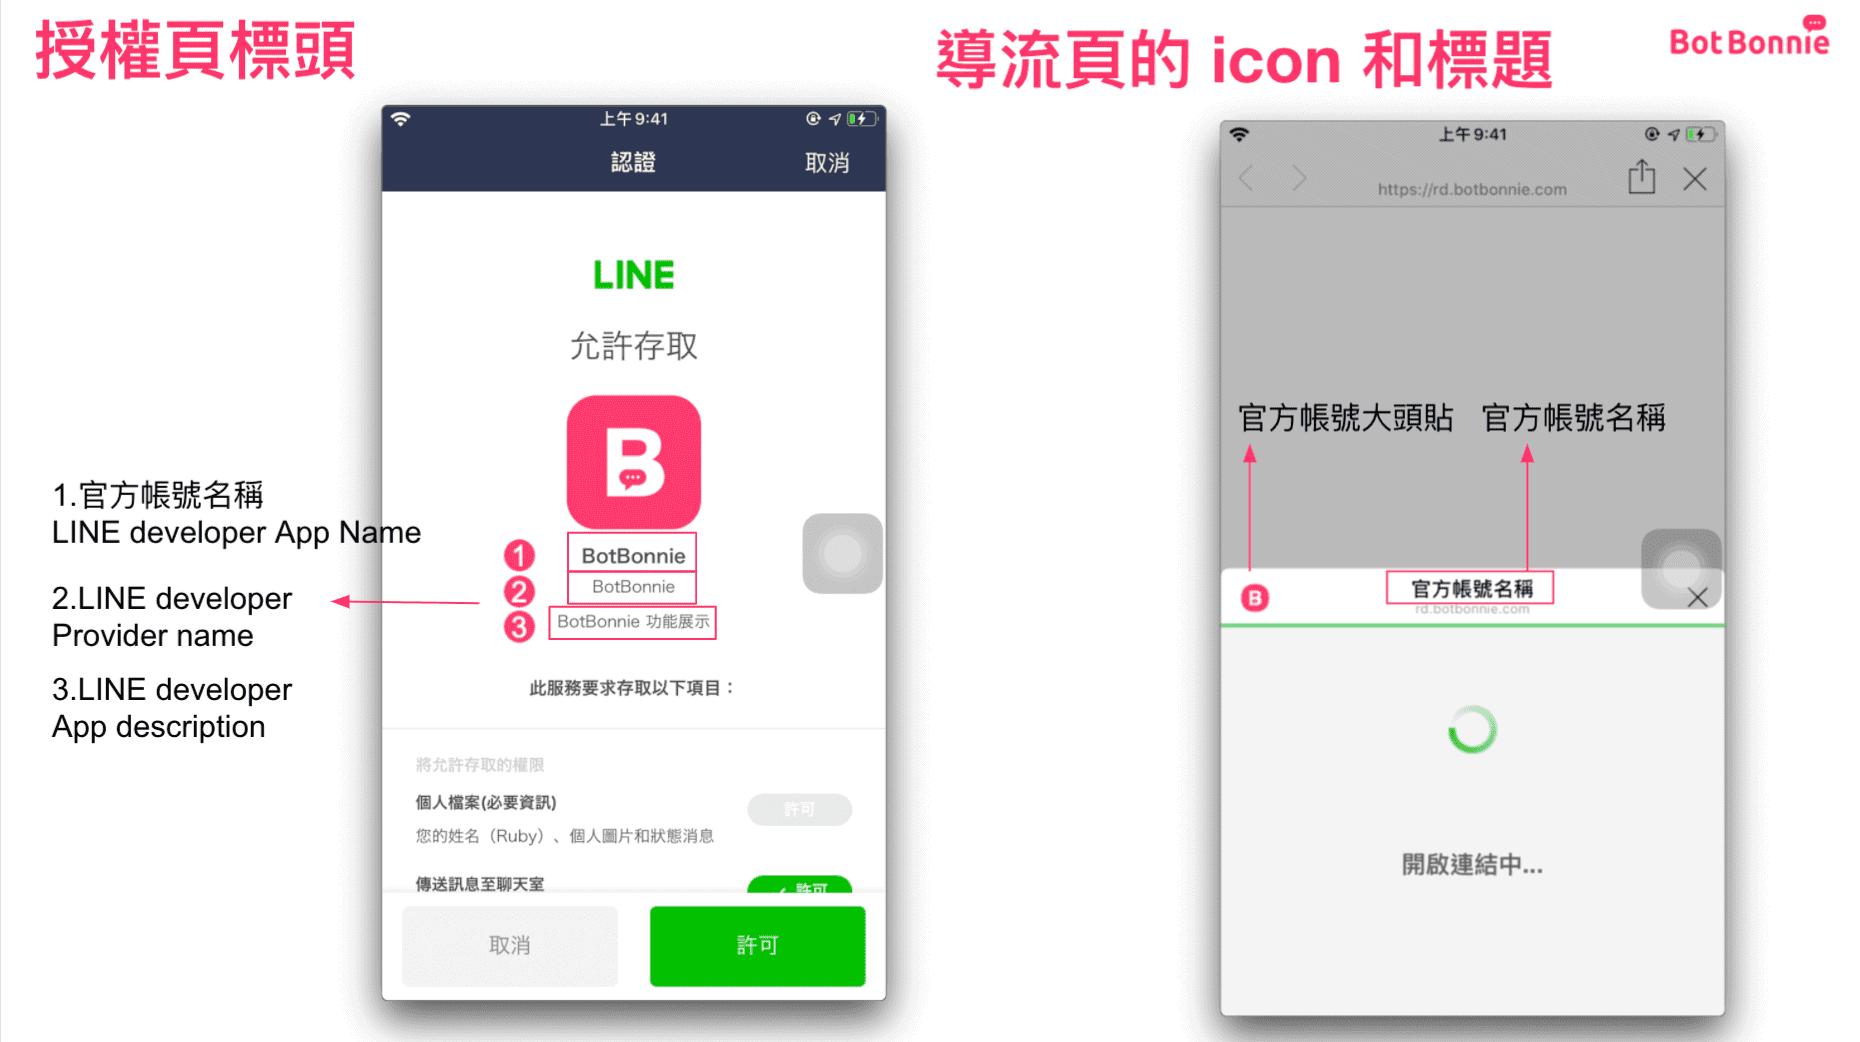 LINE 智能連結介面說明